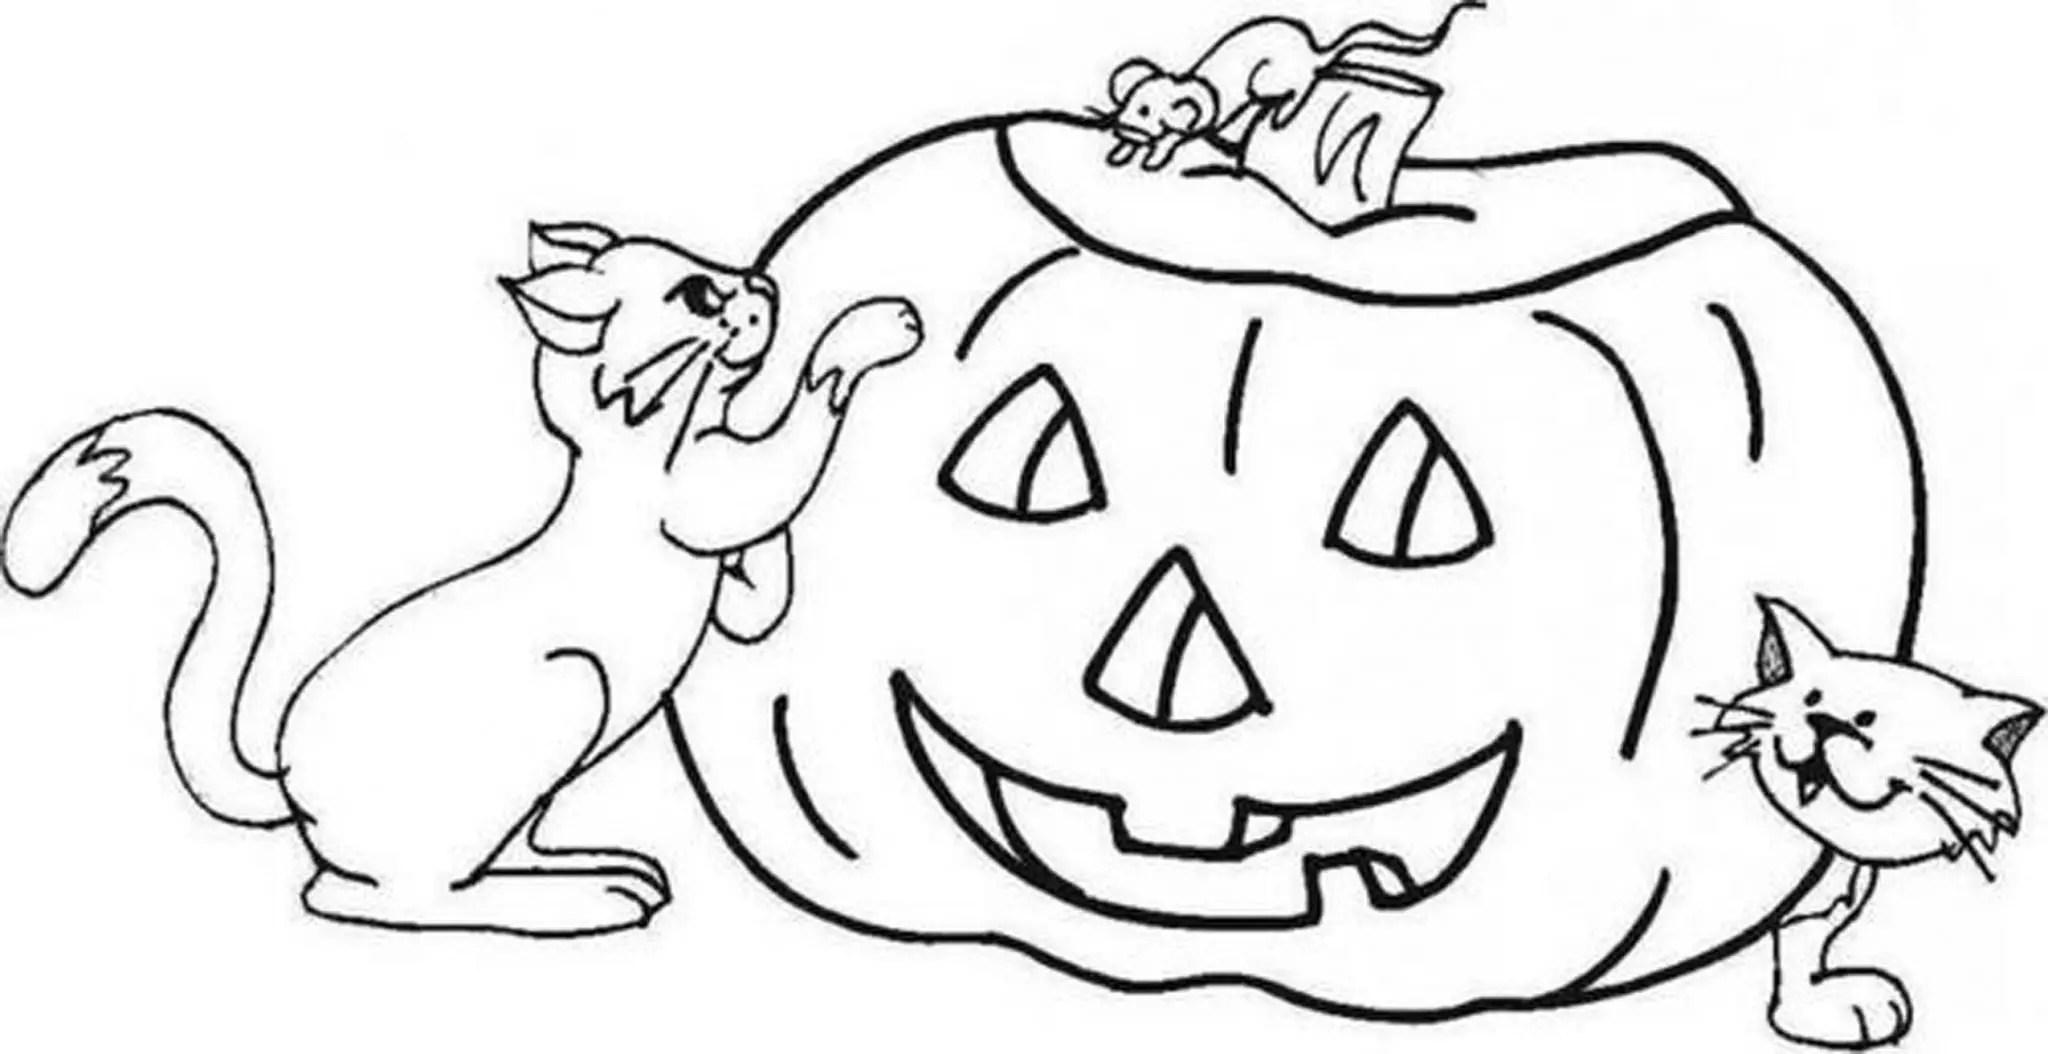 Fall Pumpkin Coloring Pages - Democraciaejustica